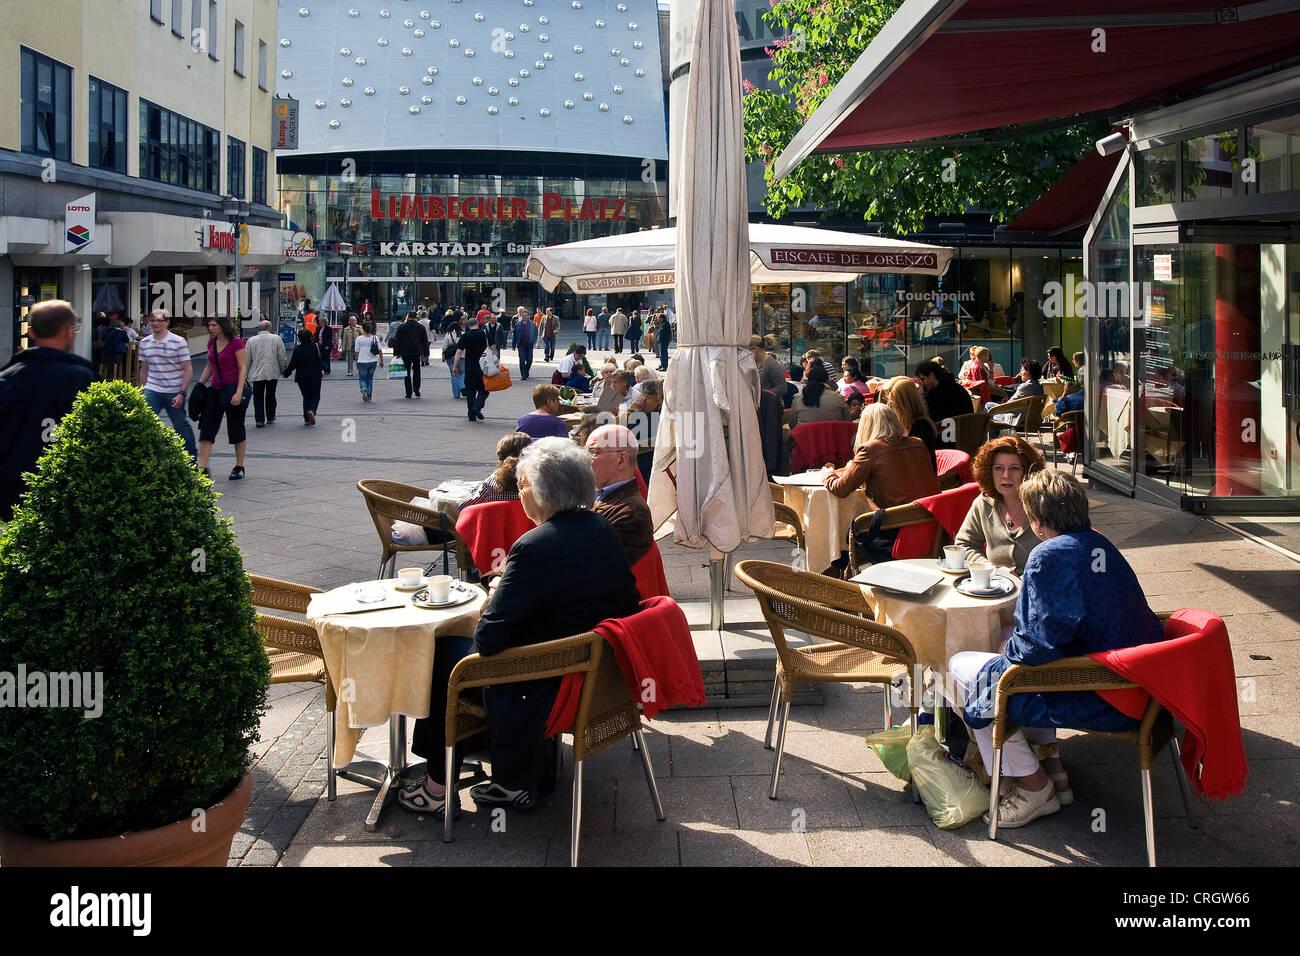 shopping mile with sidewalk cafe, Germany, North Rhine-Westphalia, Ruhr Area, Essen - Stock Image